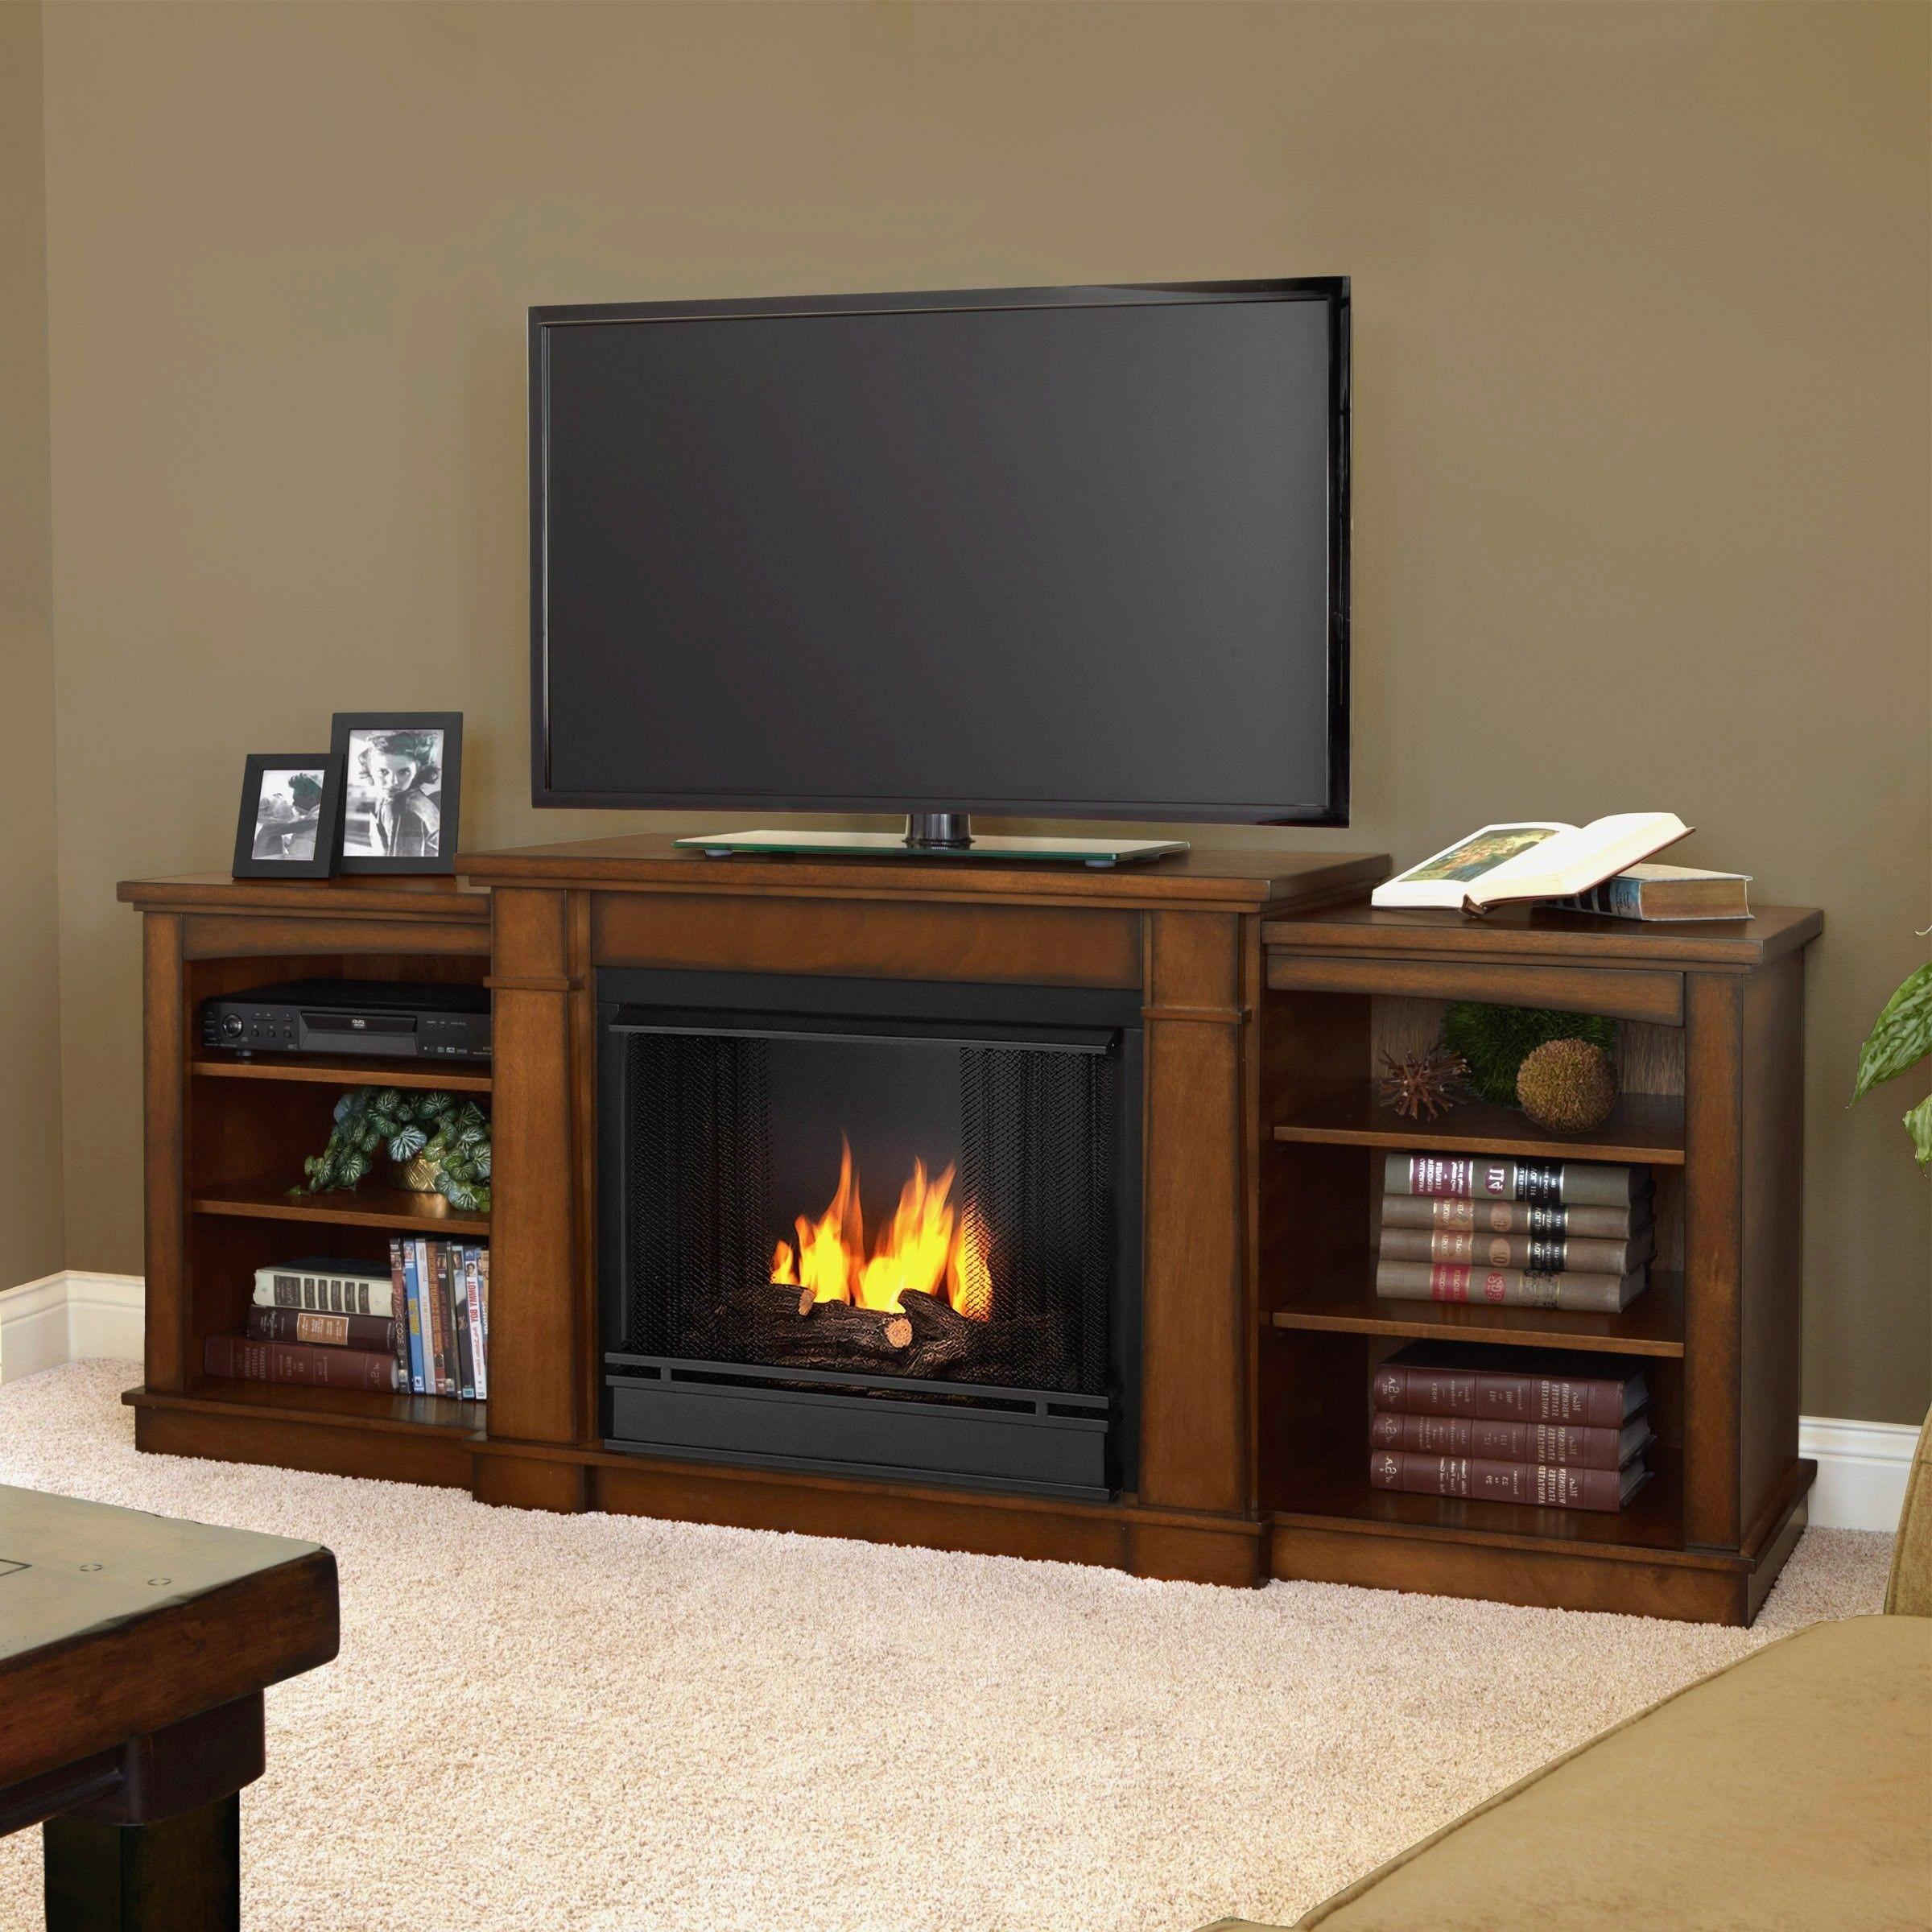 fireplace tv stands for flat screens ideas on foter rh foter com